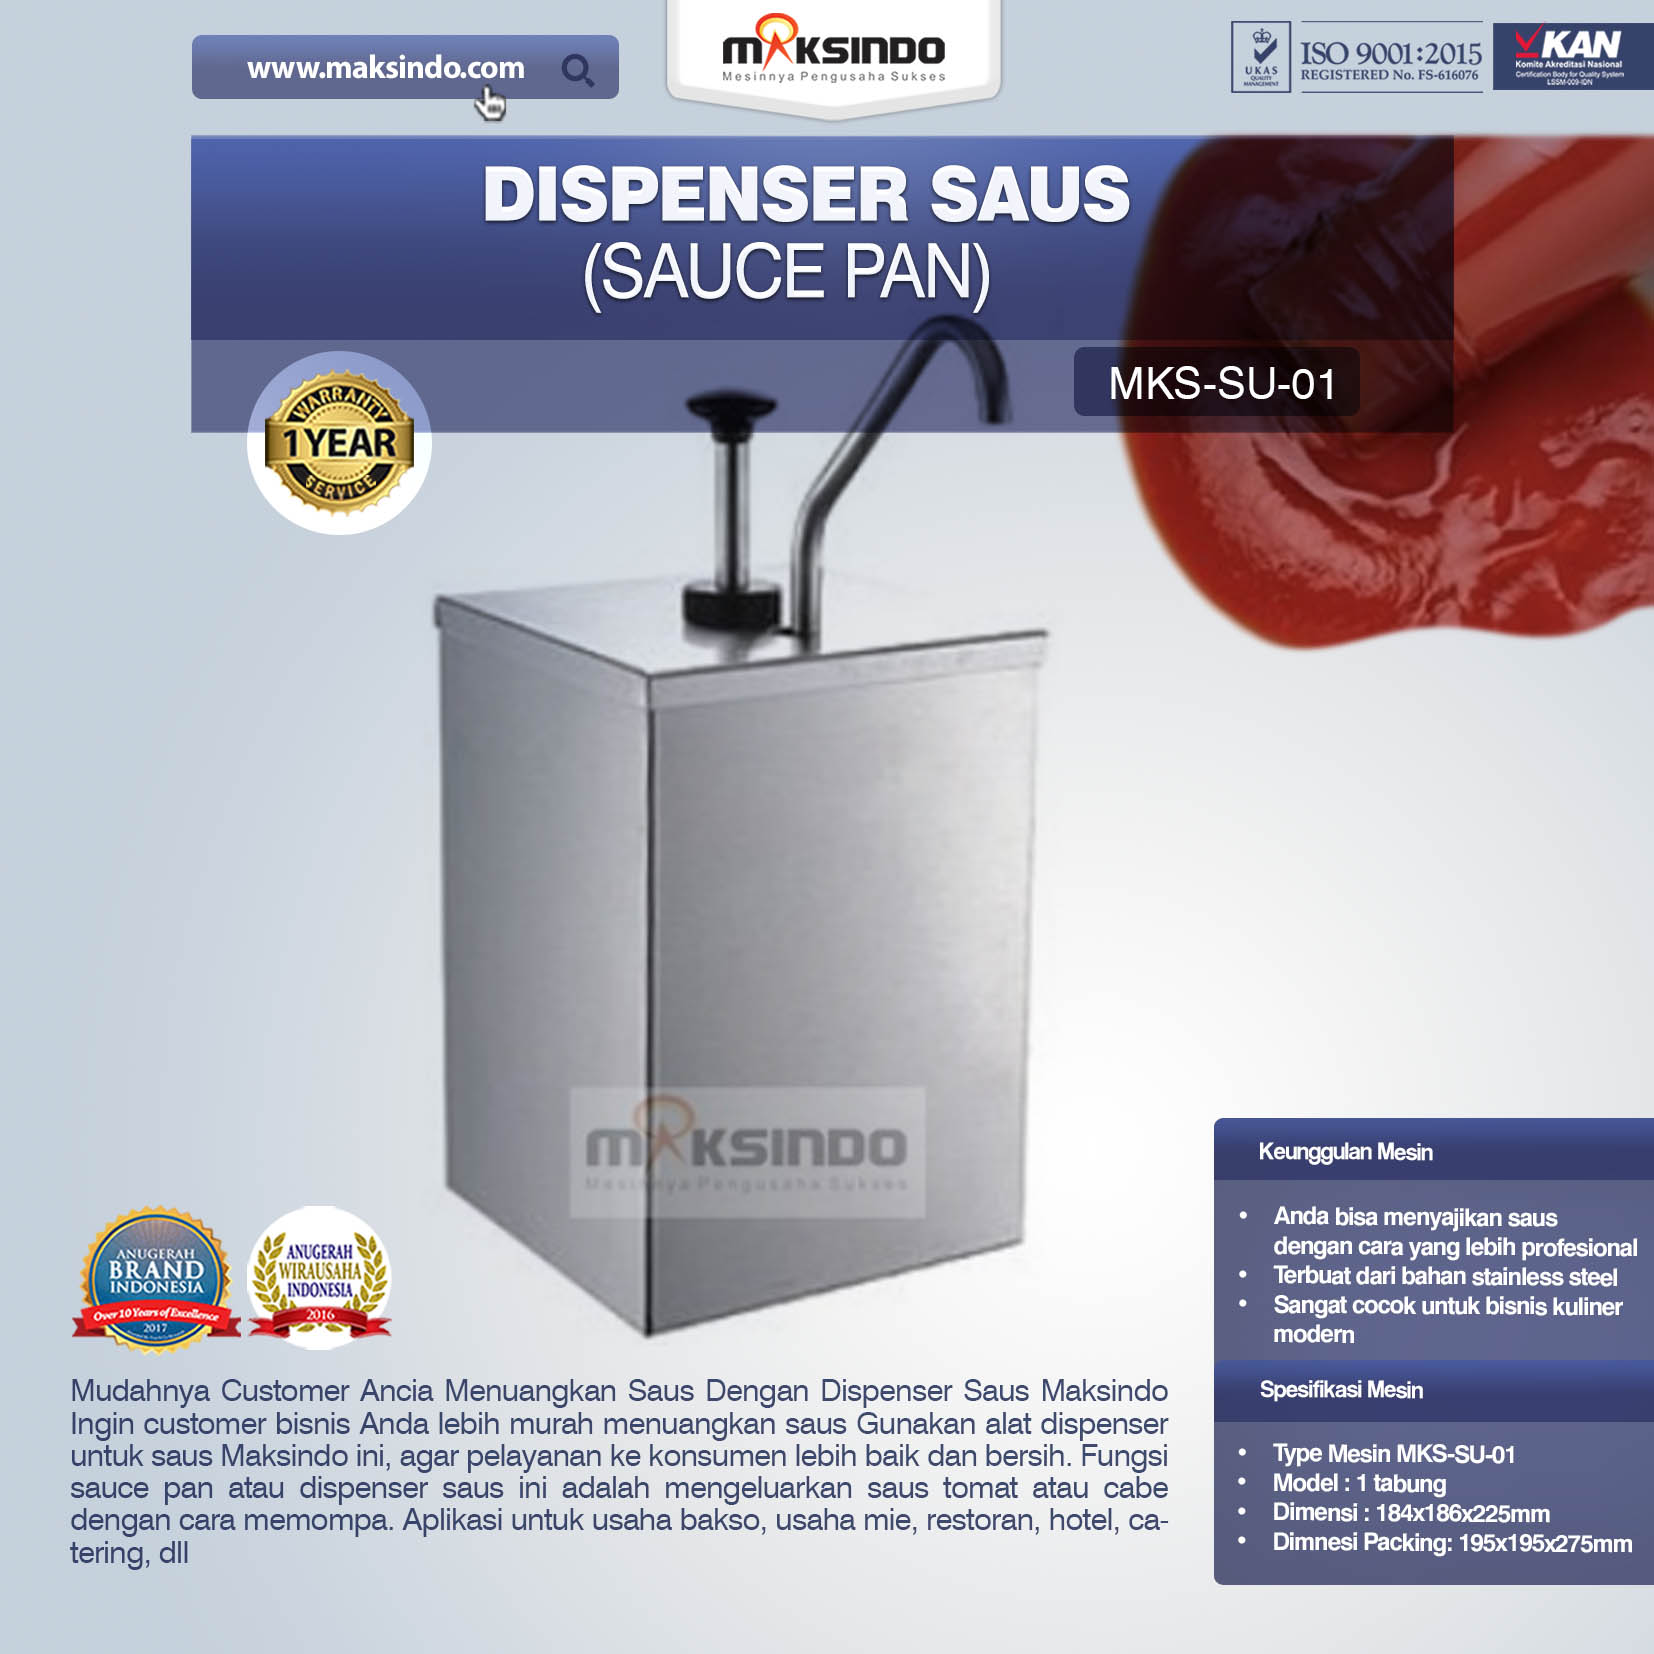 Jual Dispenser Saus (Sauce Pan) SU-01 di Bali